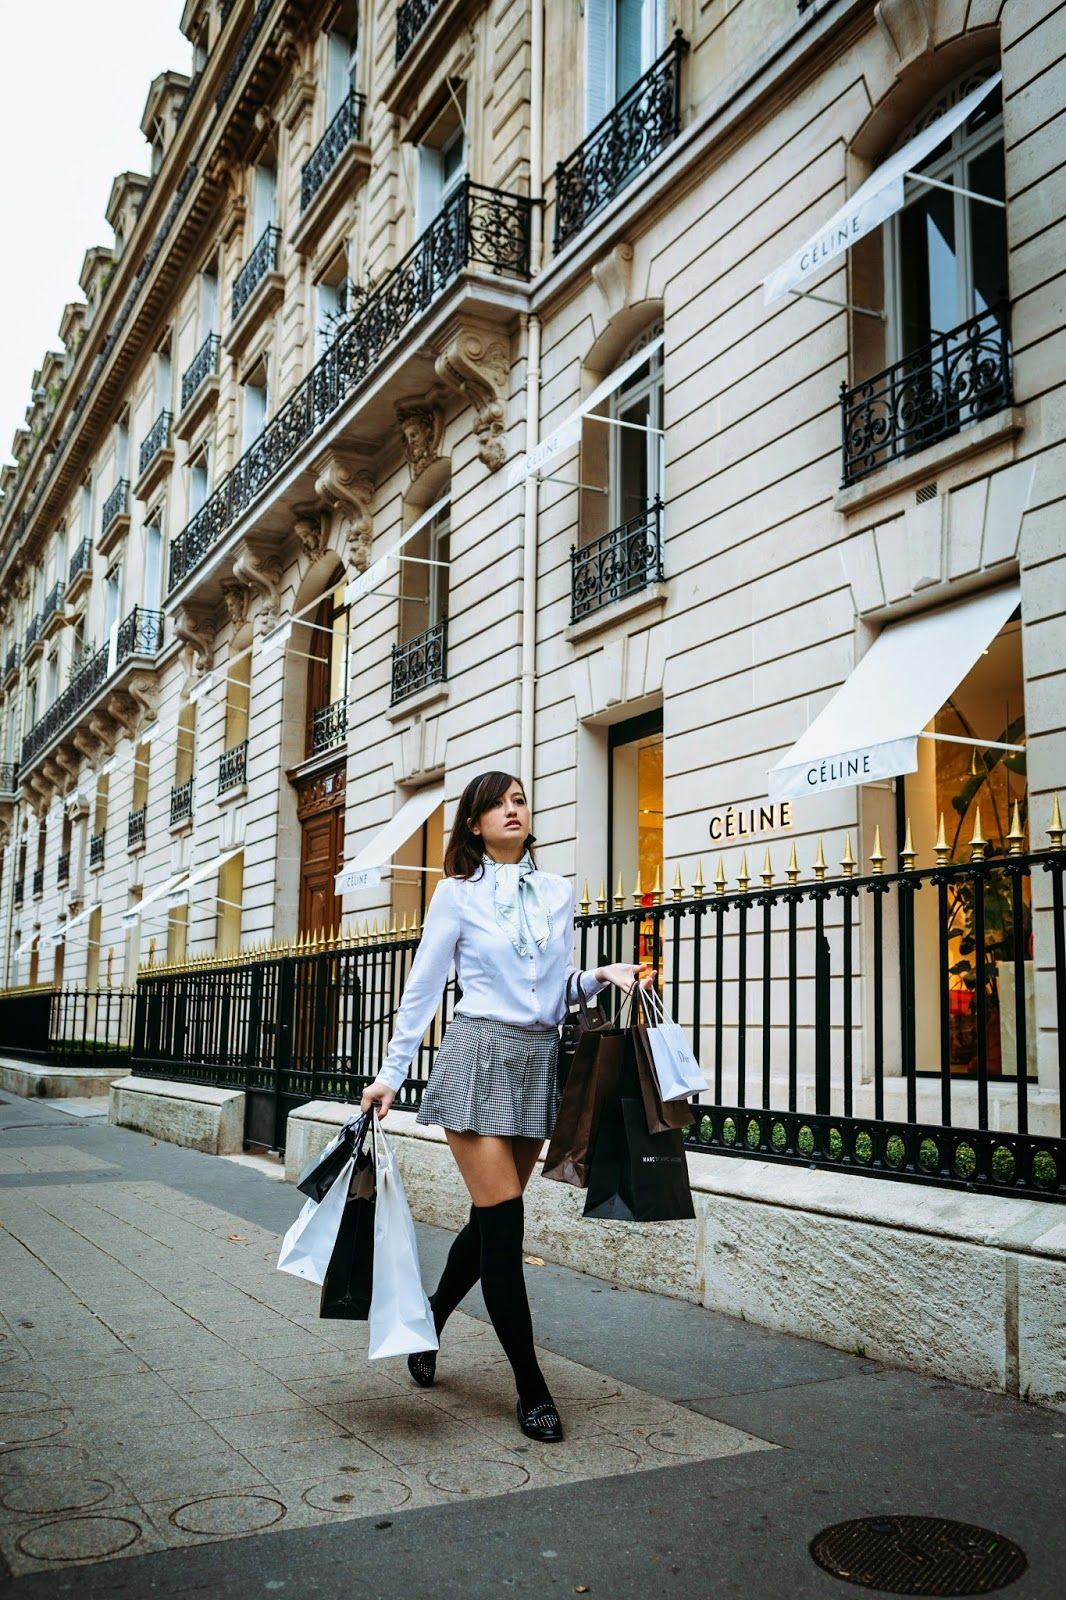 Parisian chic fashion